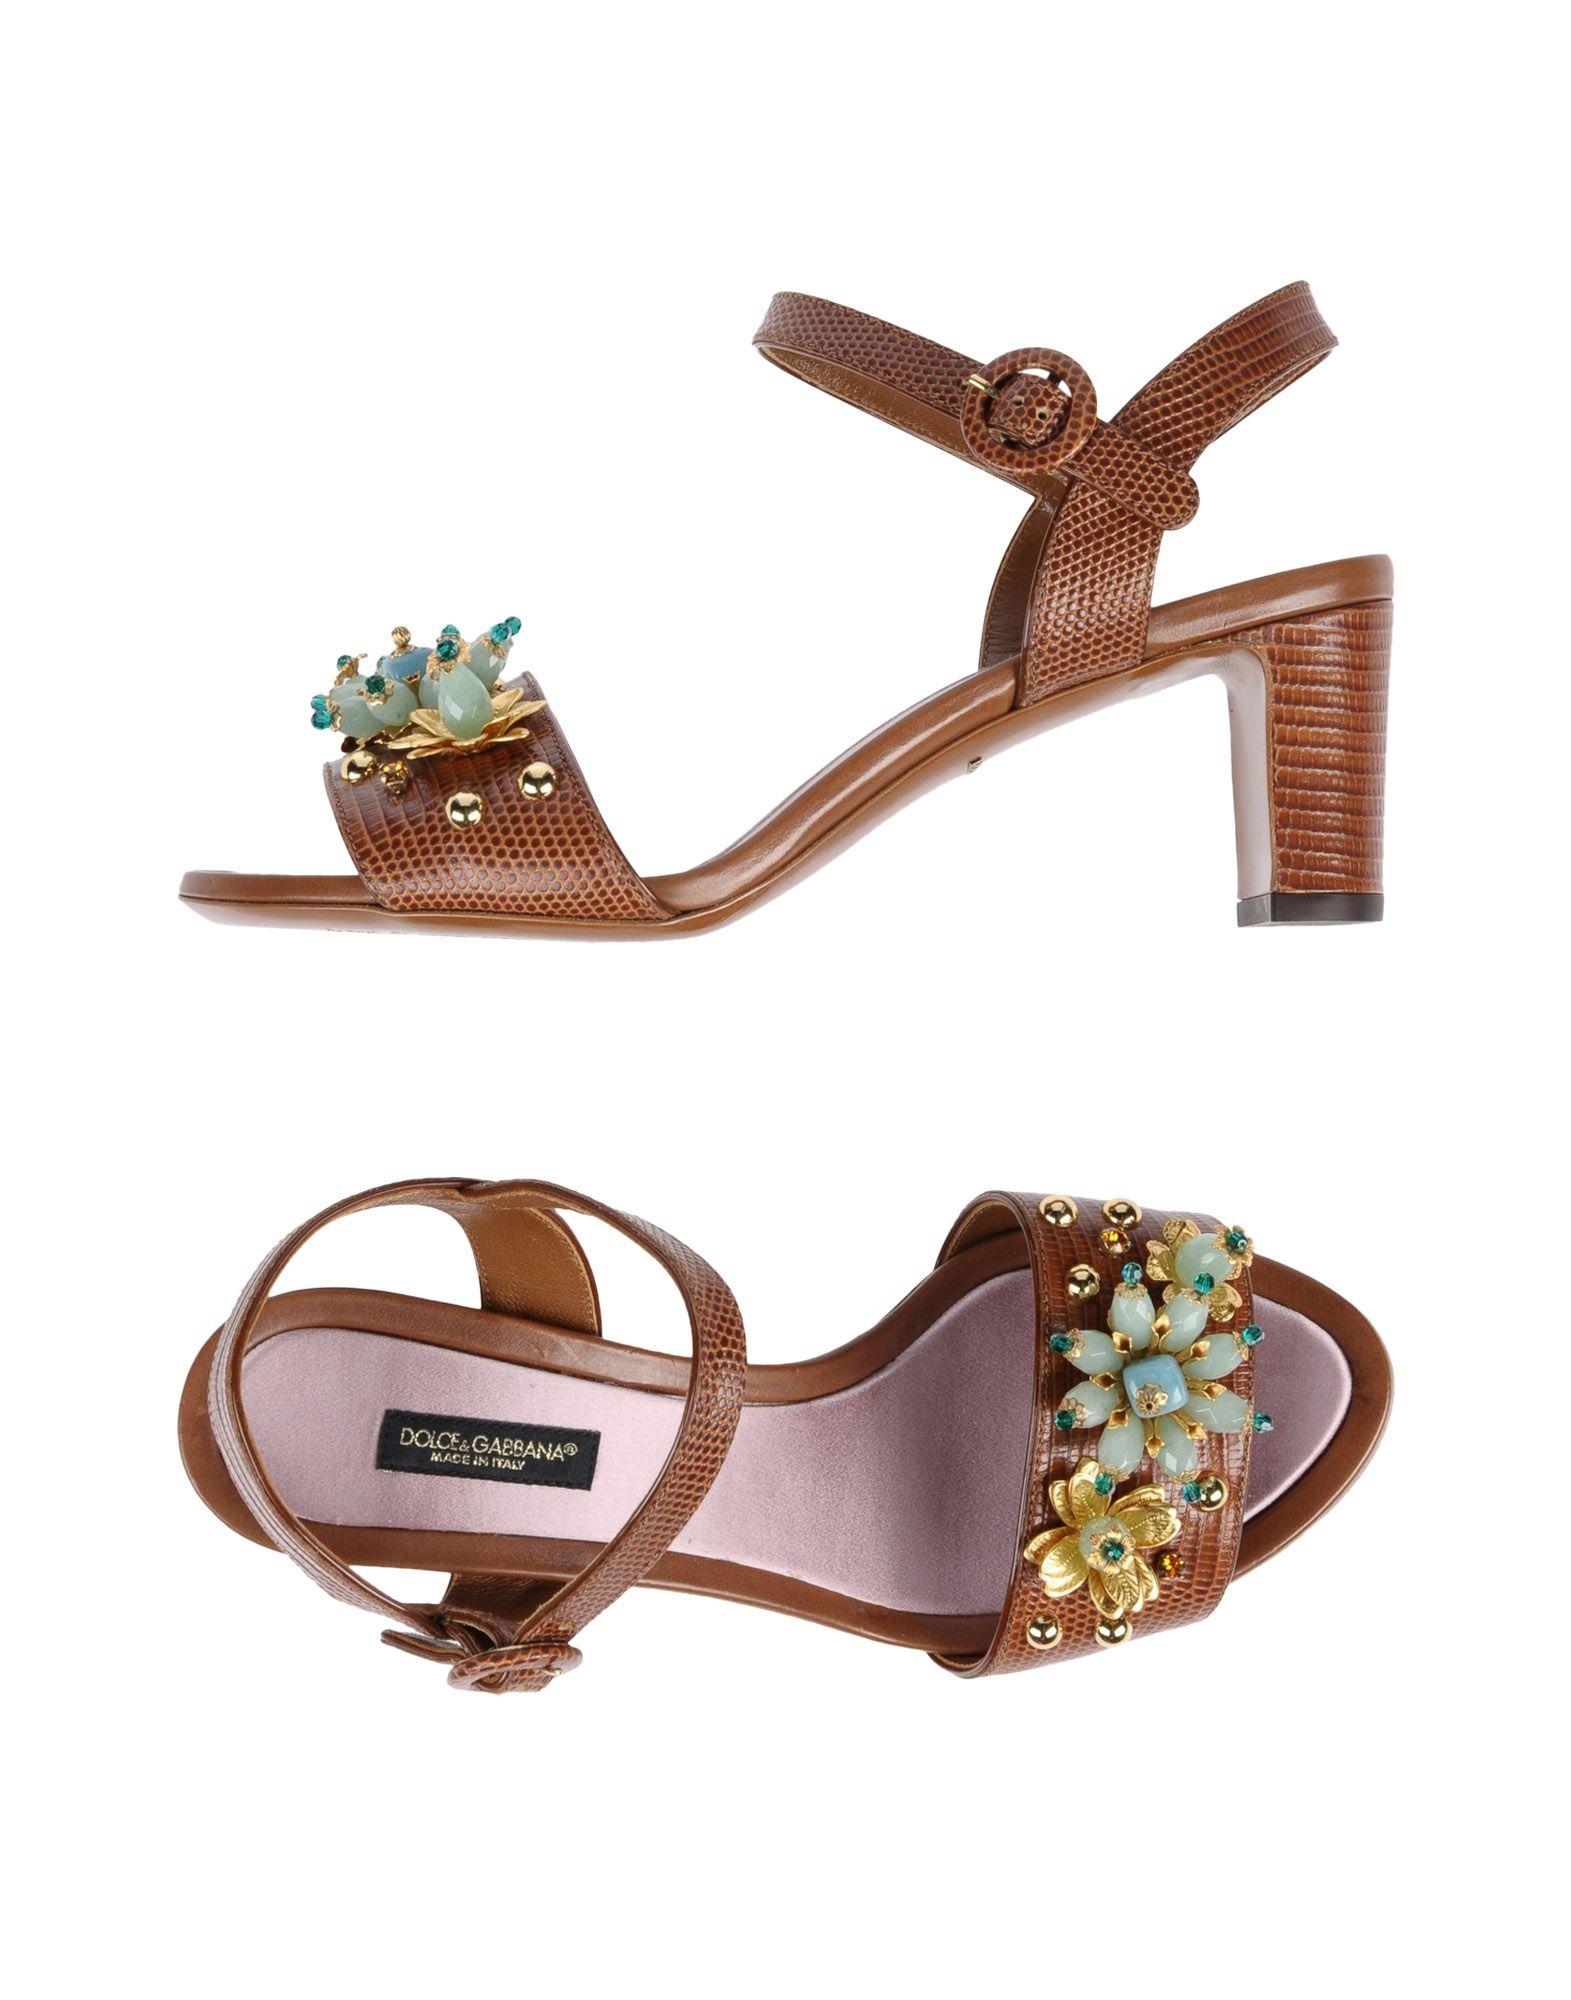 Dolce & 11430676XNGünstige Gabbana Sandalen Damen  11430676XNGünstige & gut aussehende Schuhe d5089d